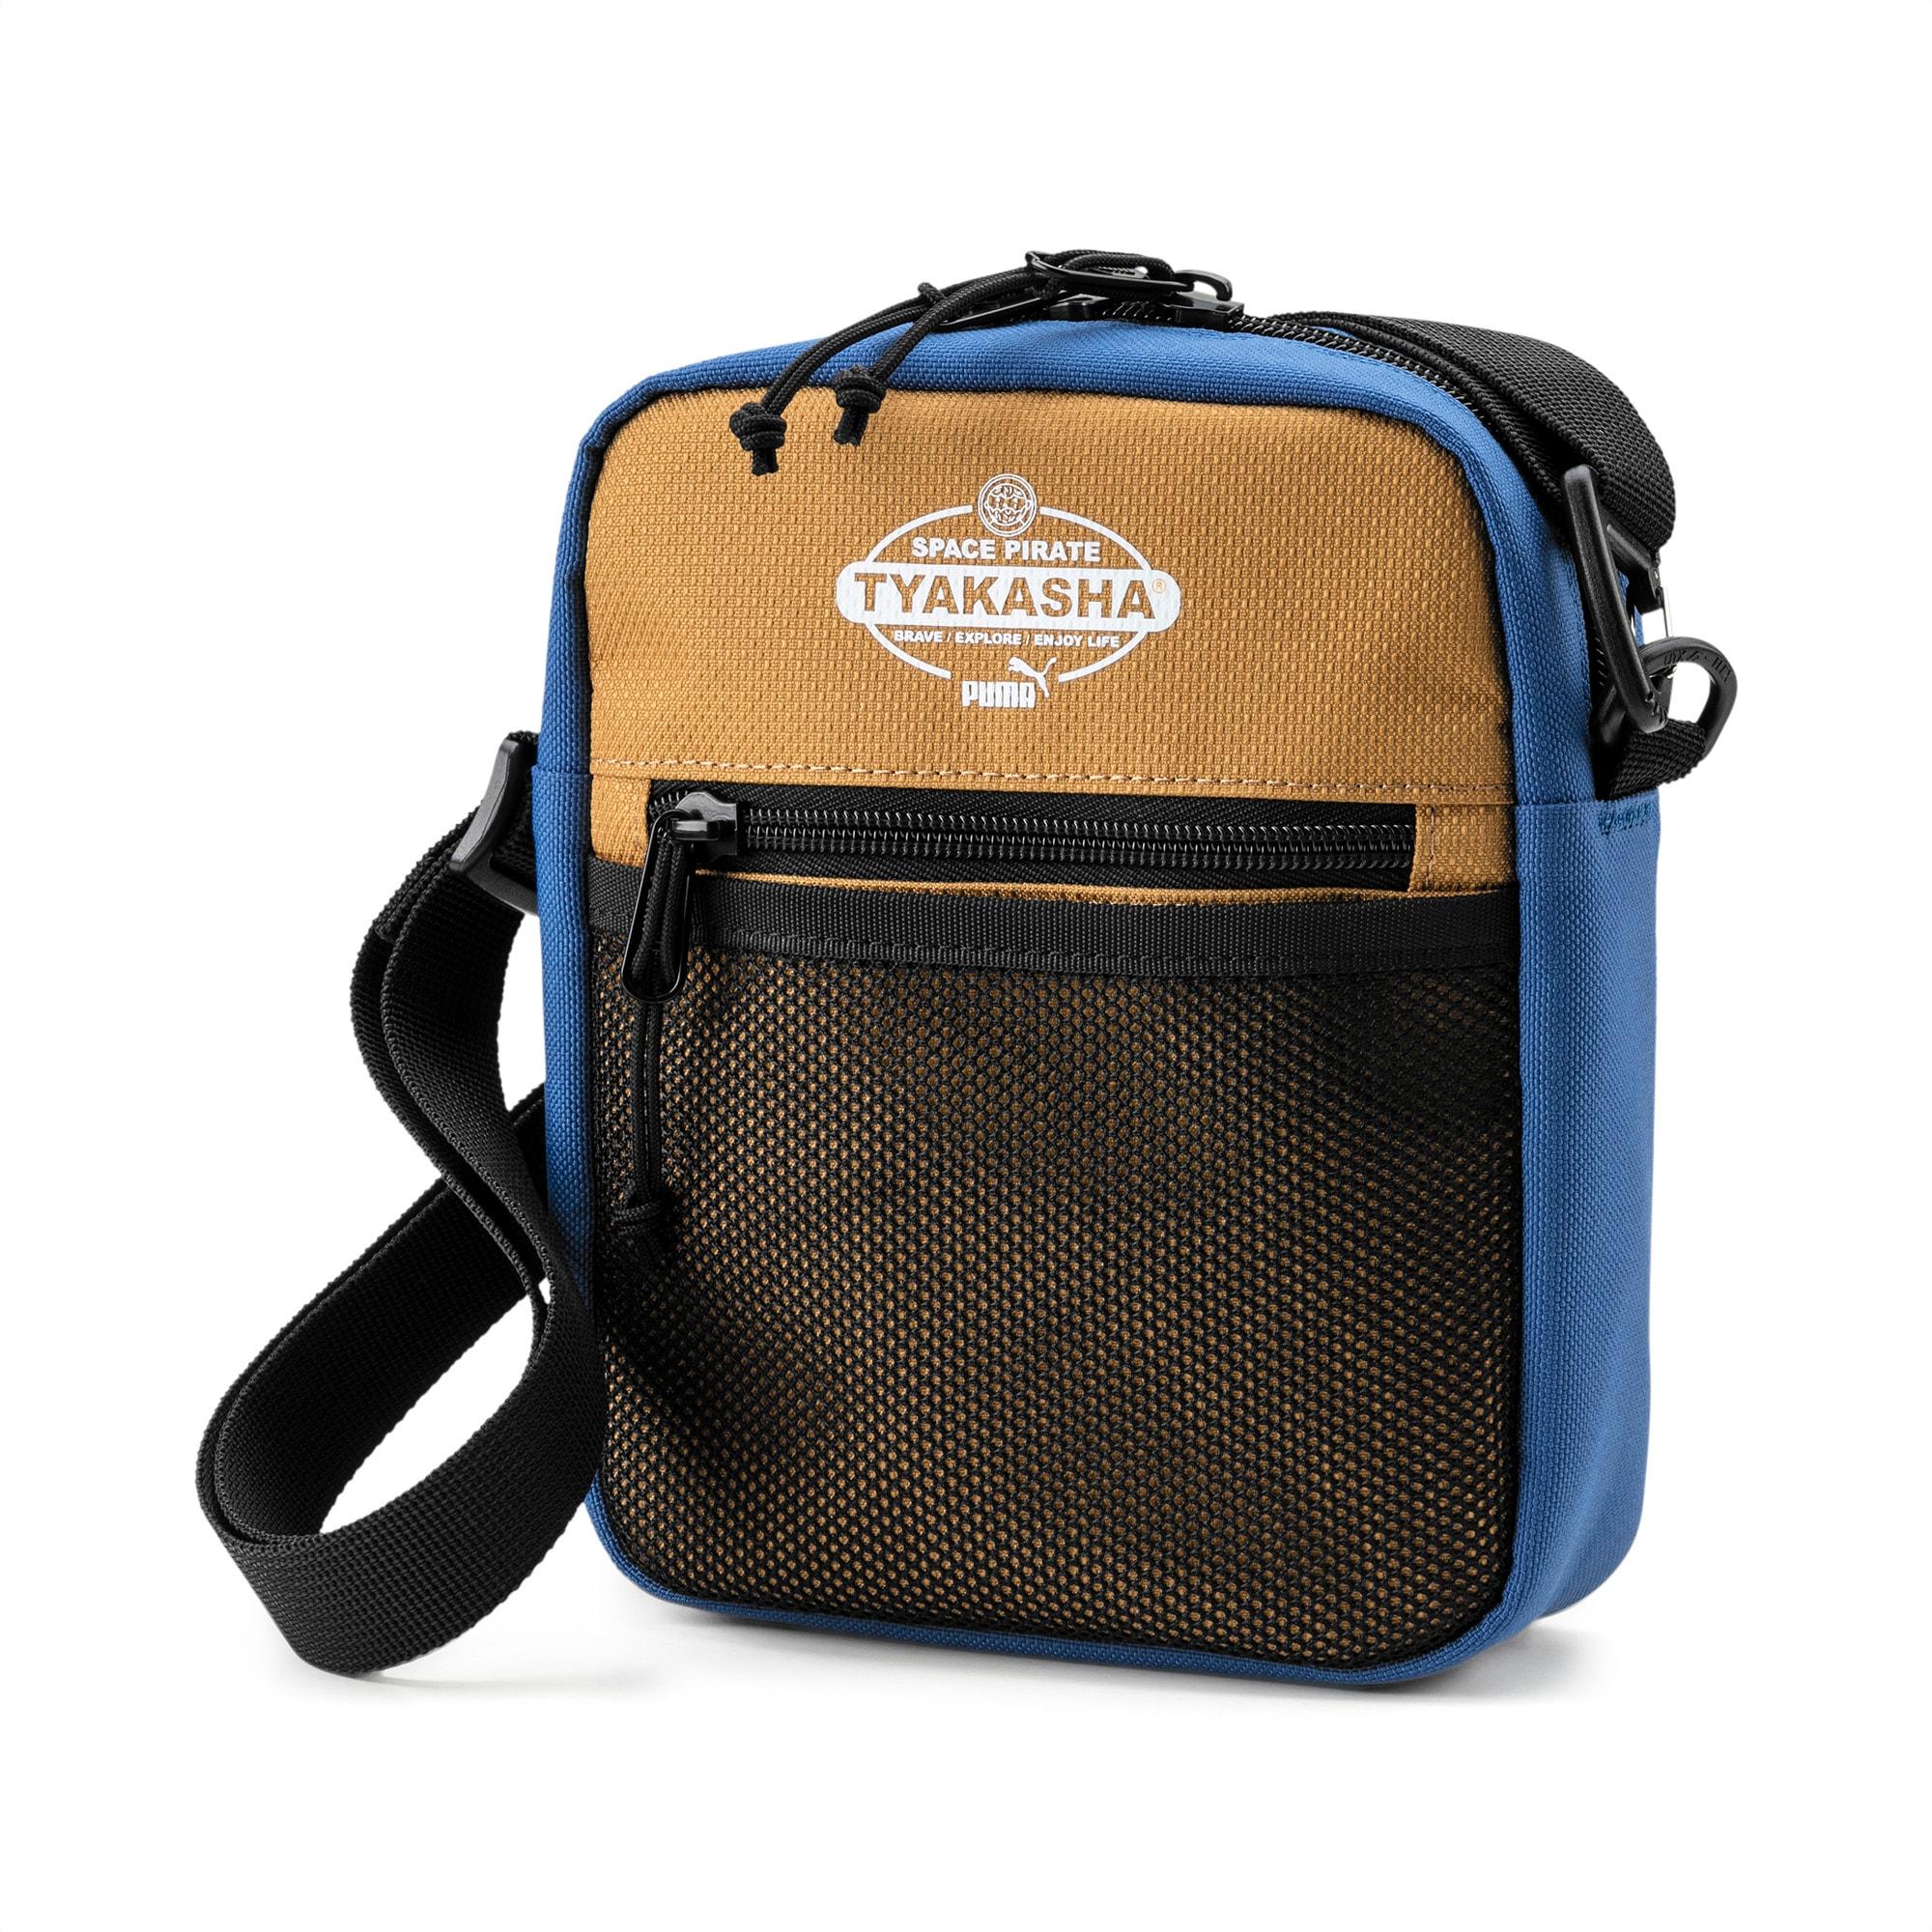 PUMA x TYAKASHA Backpack | 01 | PUMA Nuovi Arrivi | PUMA Italia